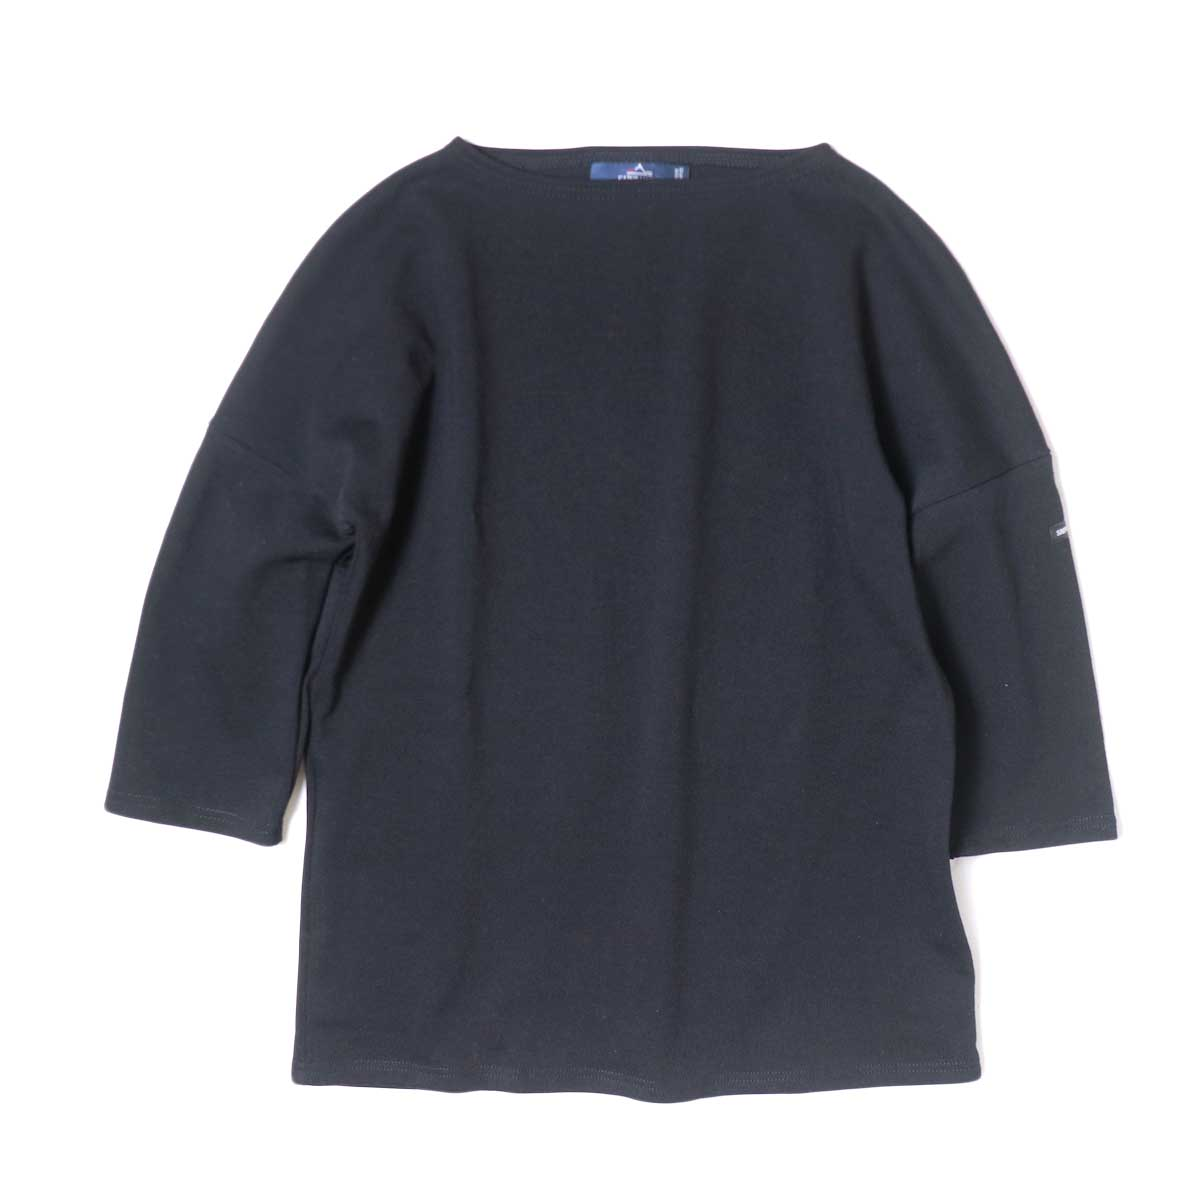 SAINT JAMES / CRAZSLOU (七分袖ドロップショルダー)(Noir)